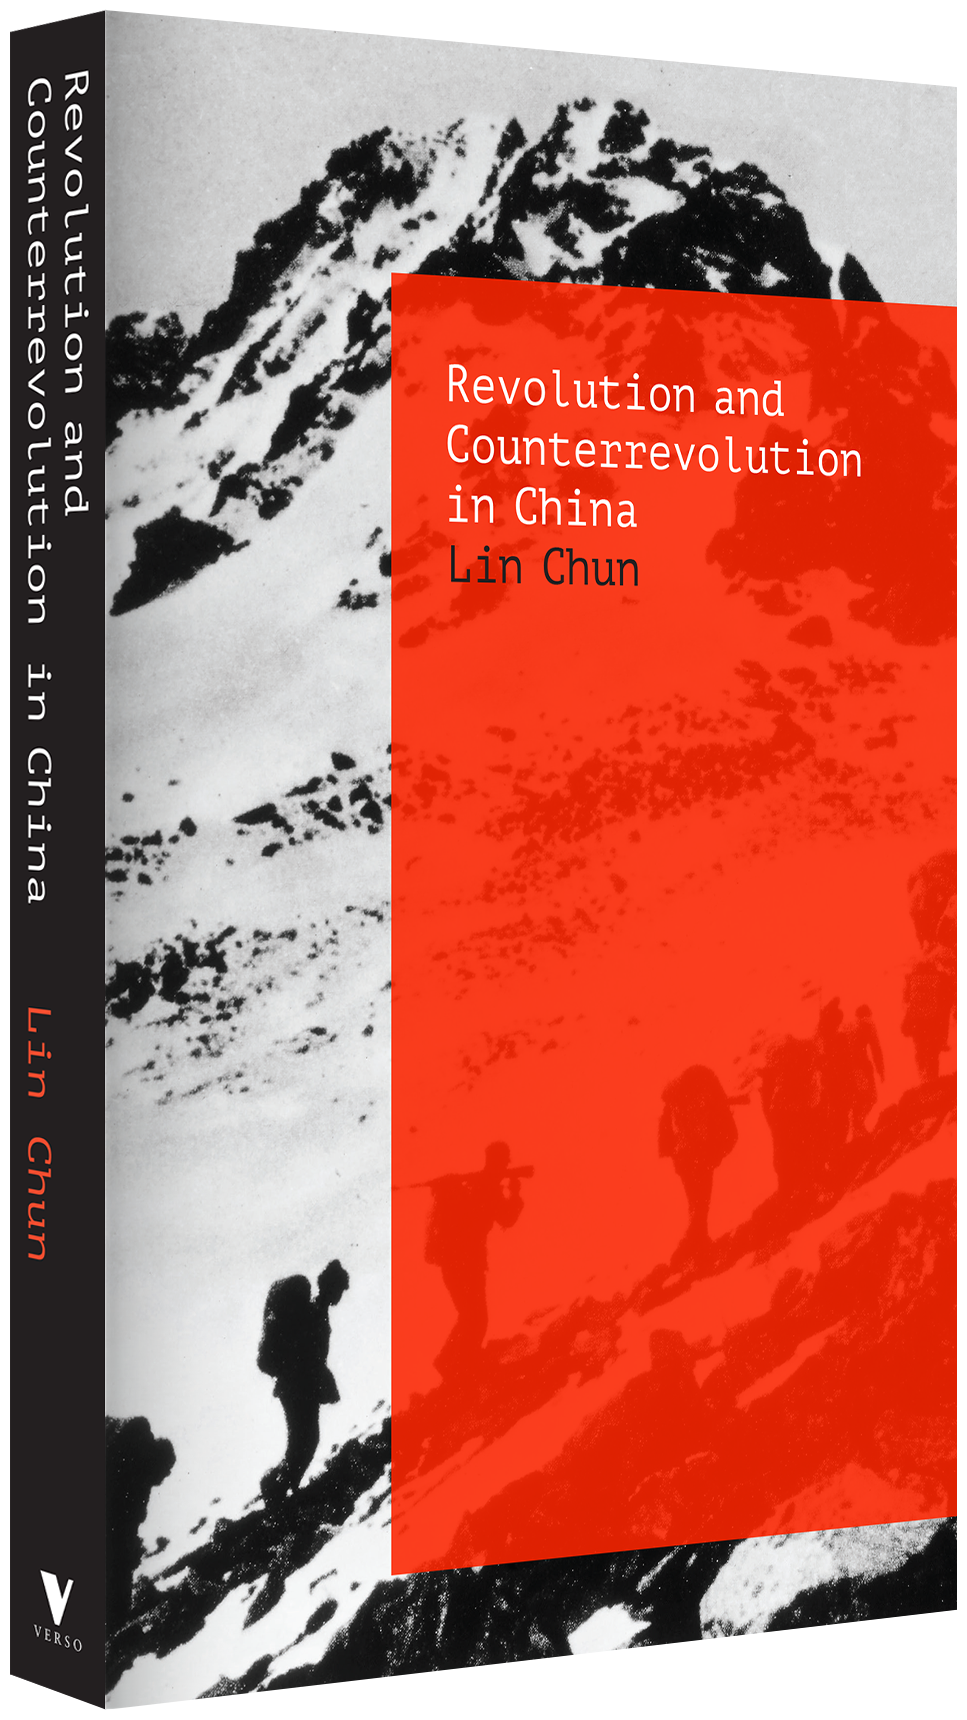 Revolution-and-counterrevolution-in-china-pb